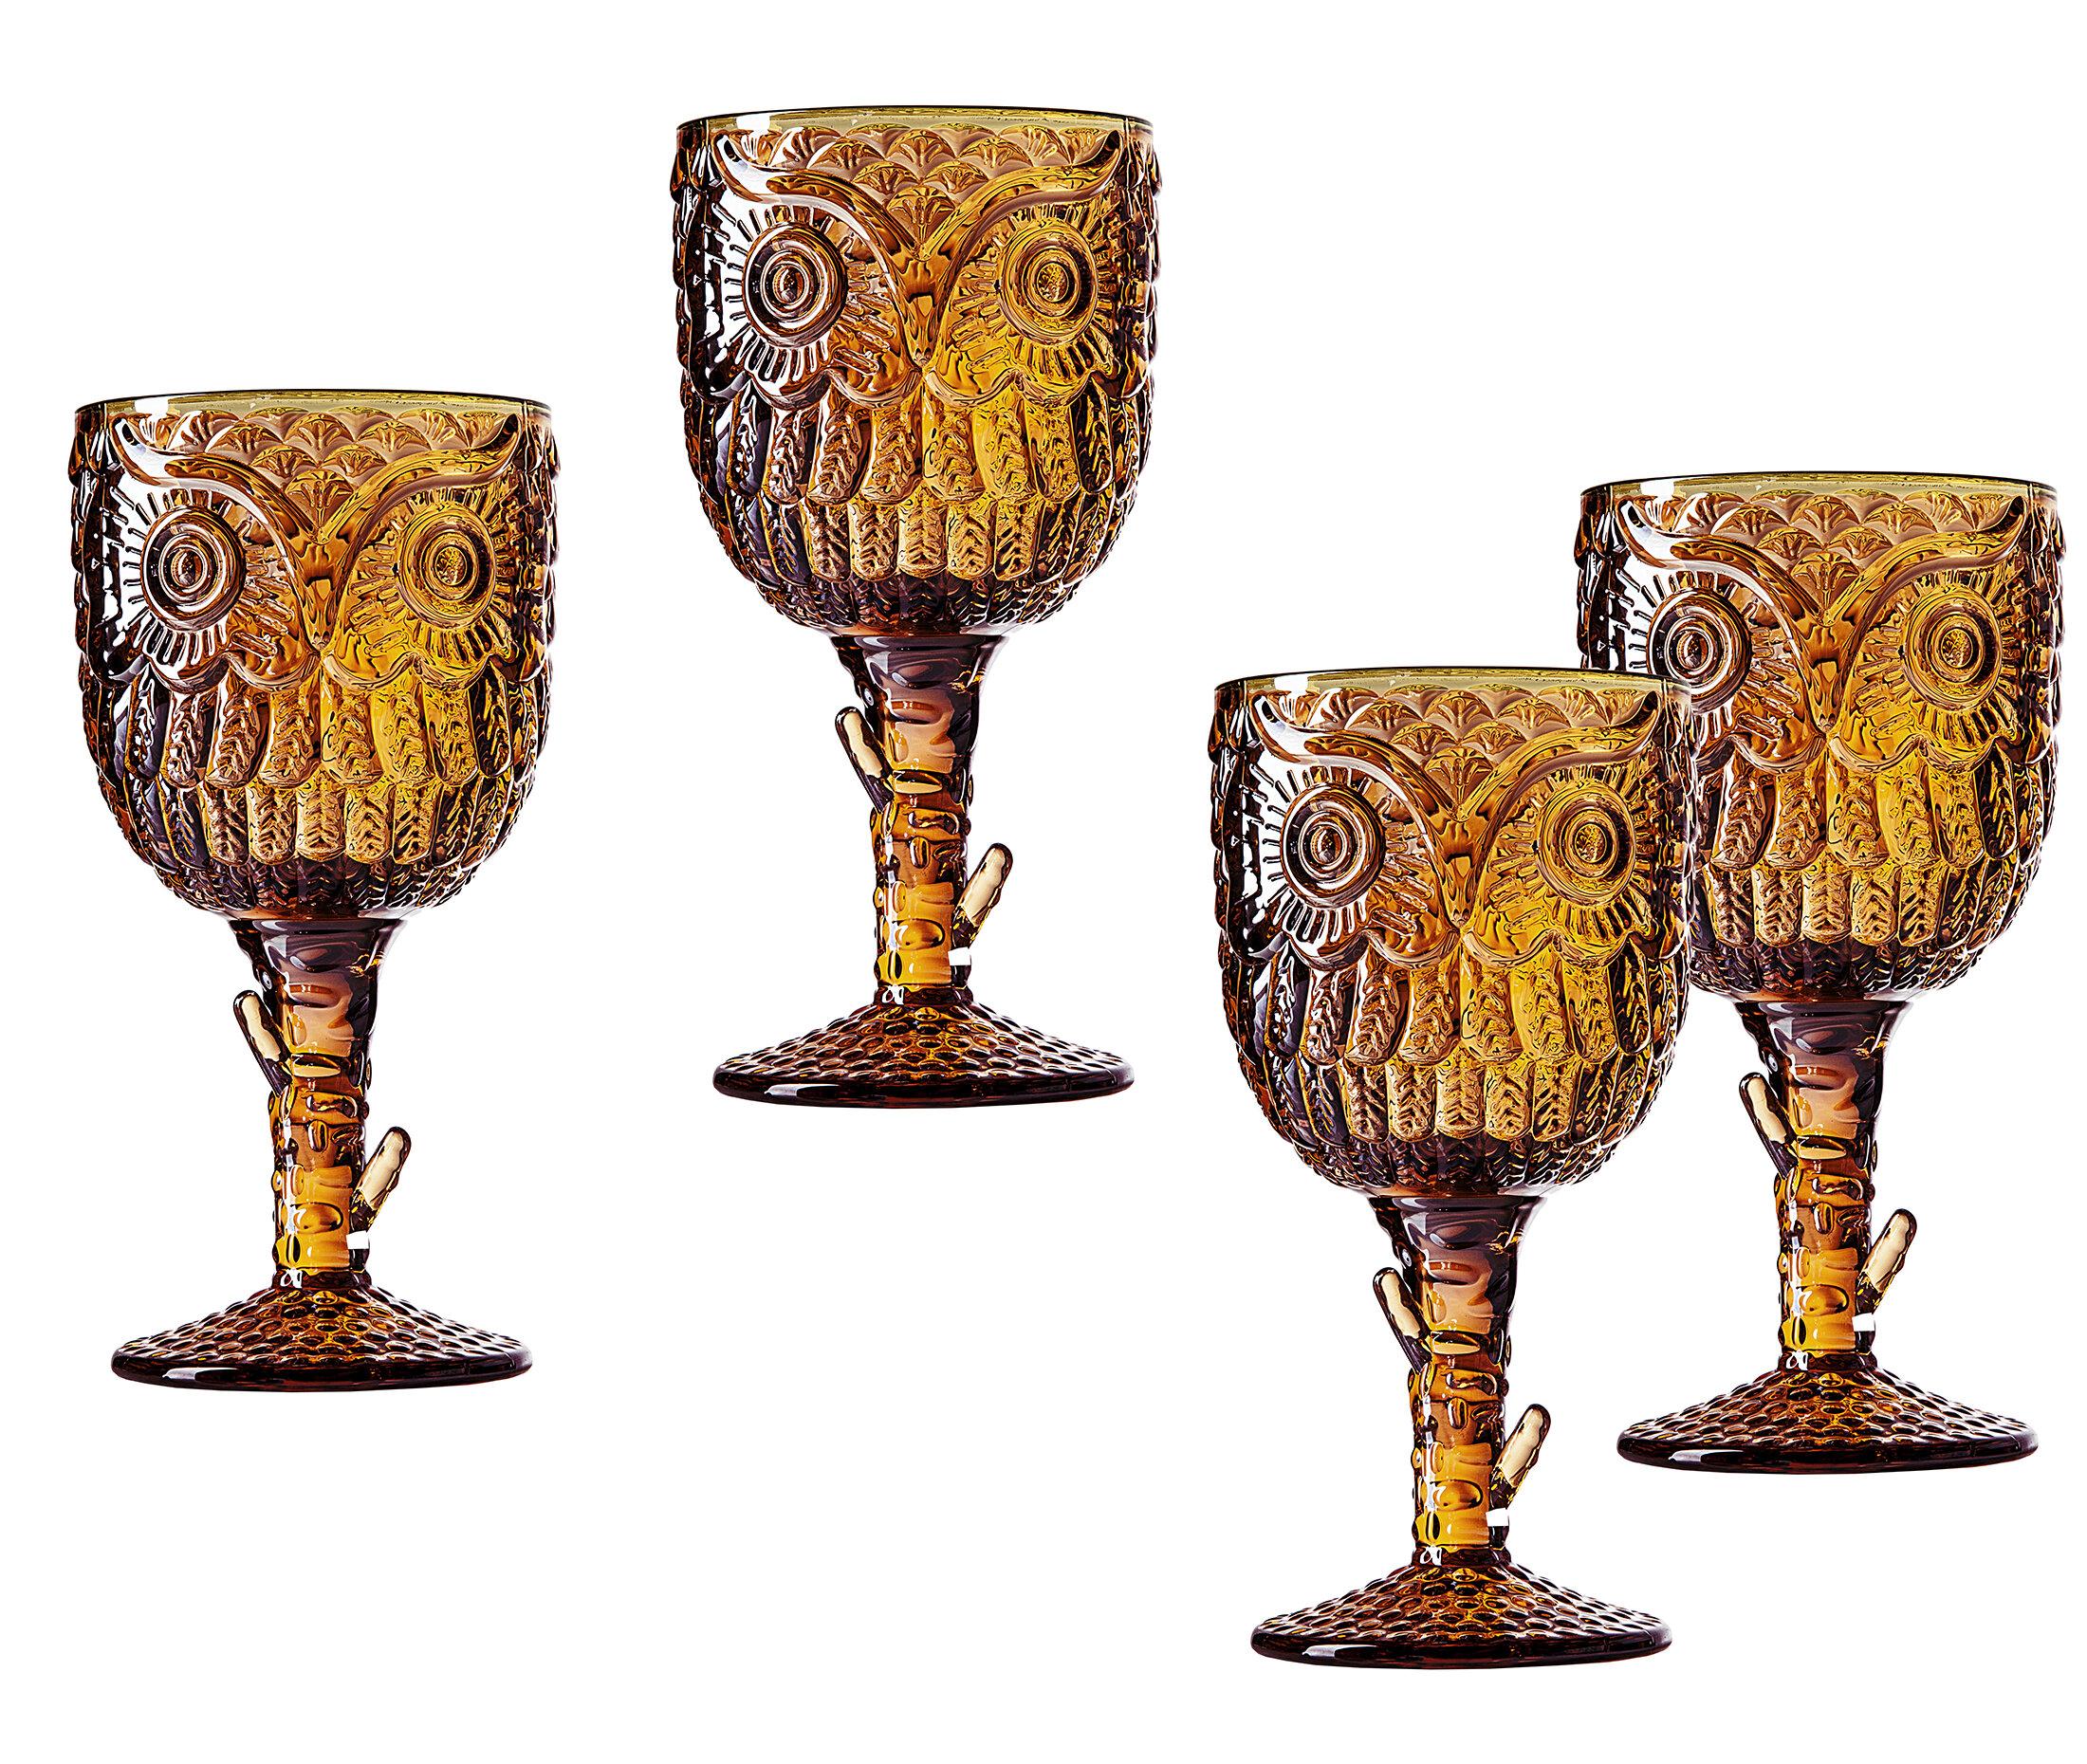 Godinger Silver Art Co Owl 10 Oz Glass Goblet Reviews Wayfair